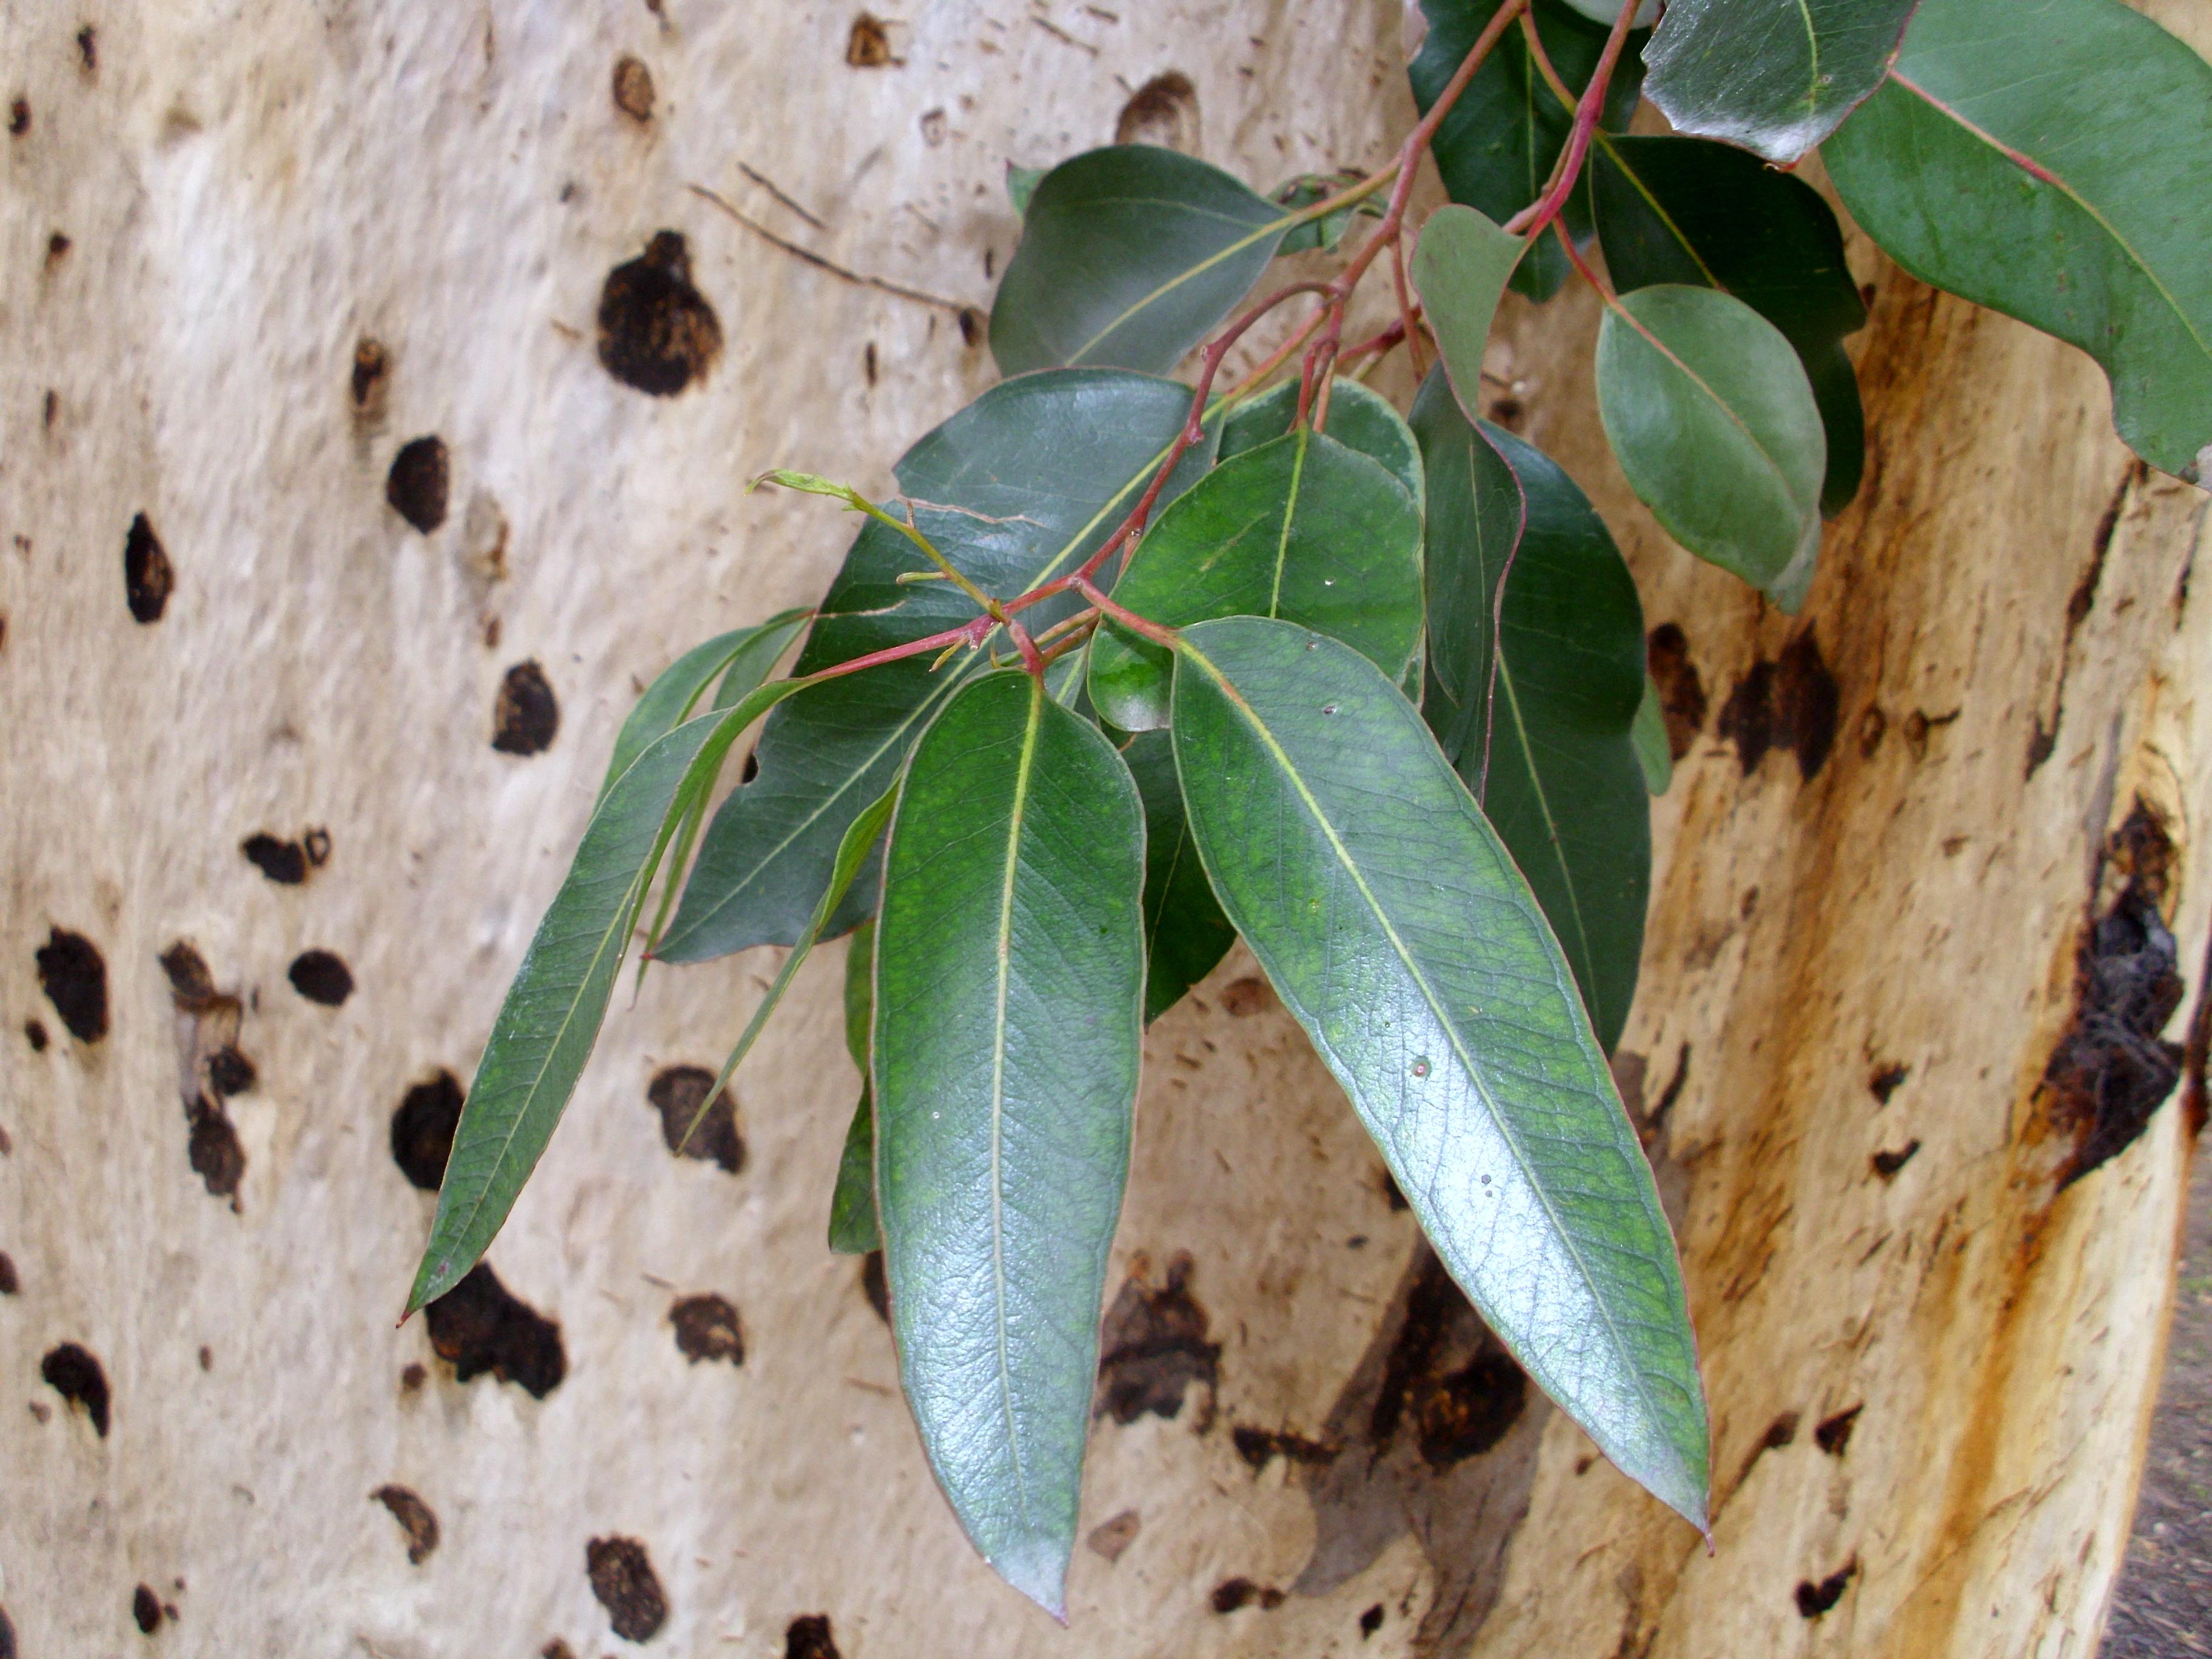 Eucalyptus_cladocalyx_leaves_and_bark by Bidgee